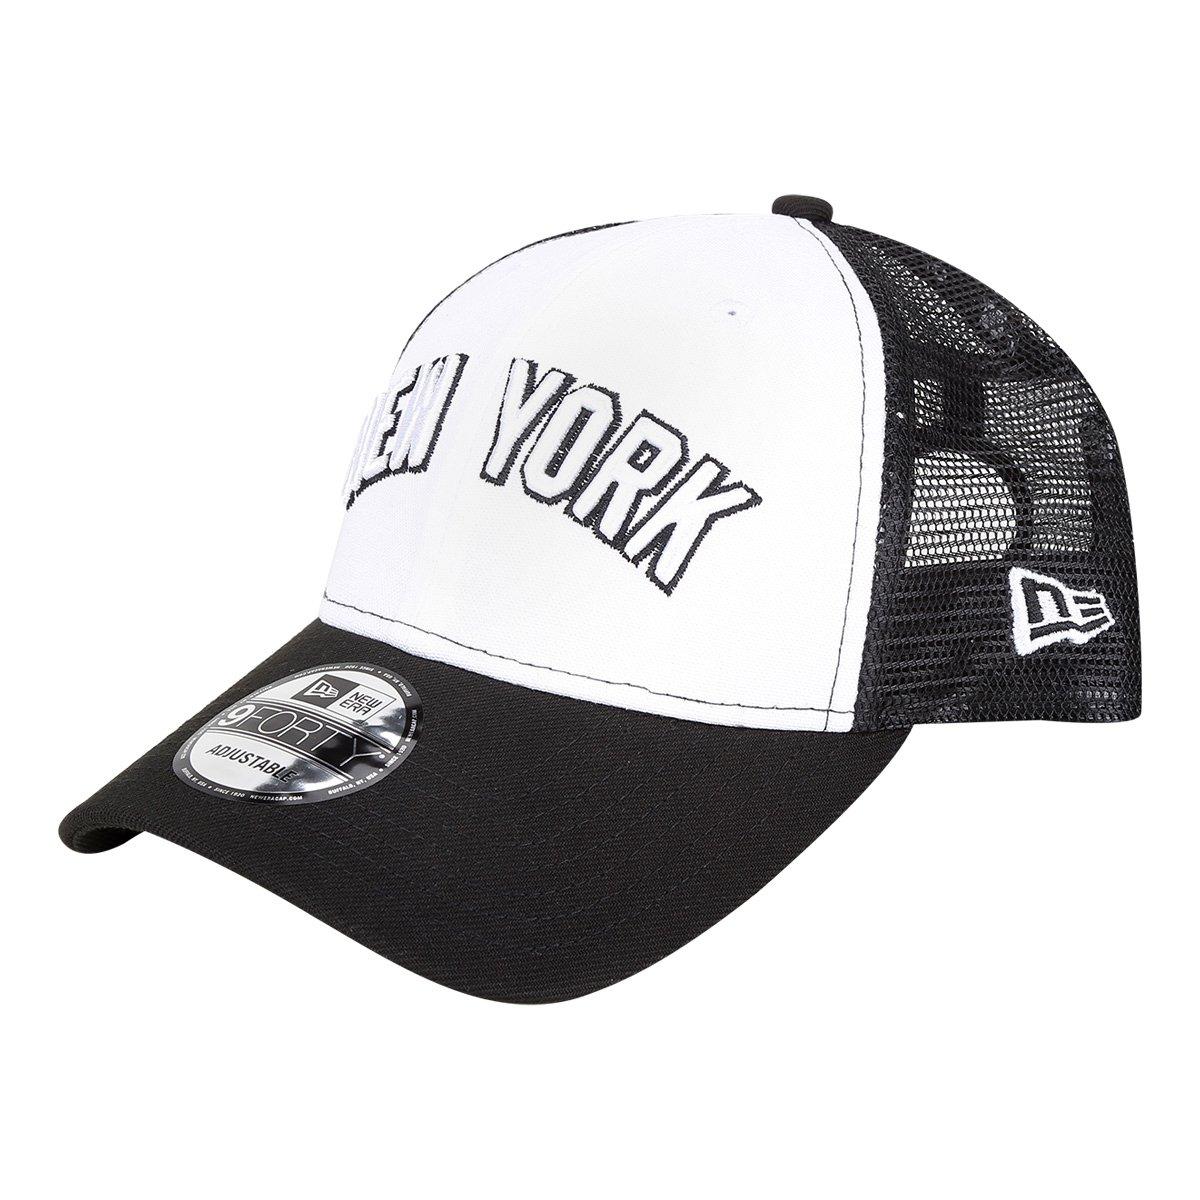 Boné New Era MLB New York Yankees Aba Curva 940 Sn Trucker - Branco e Preto  - Compre Agora  5010e654713